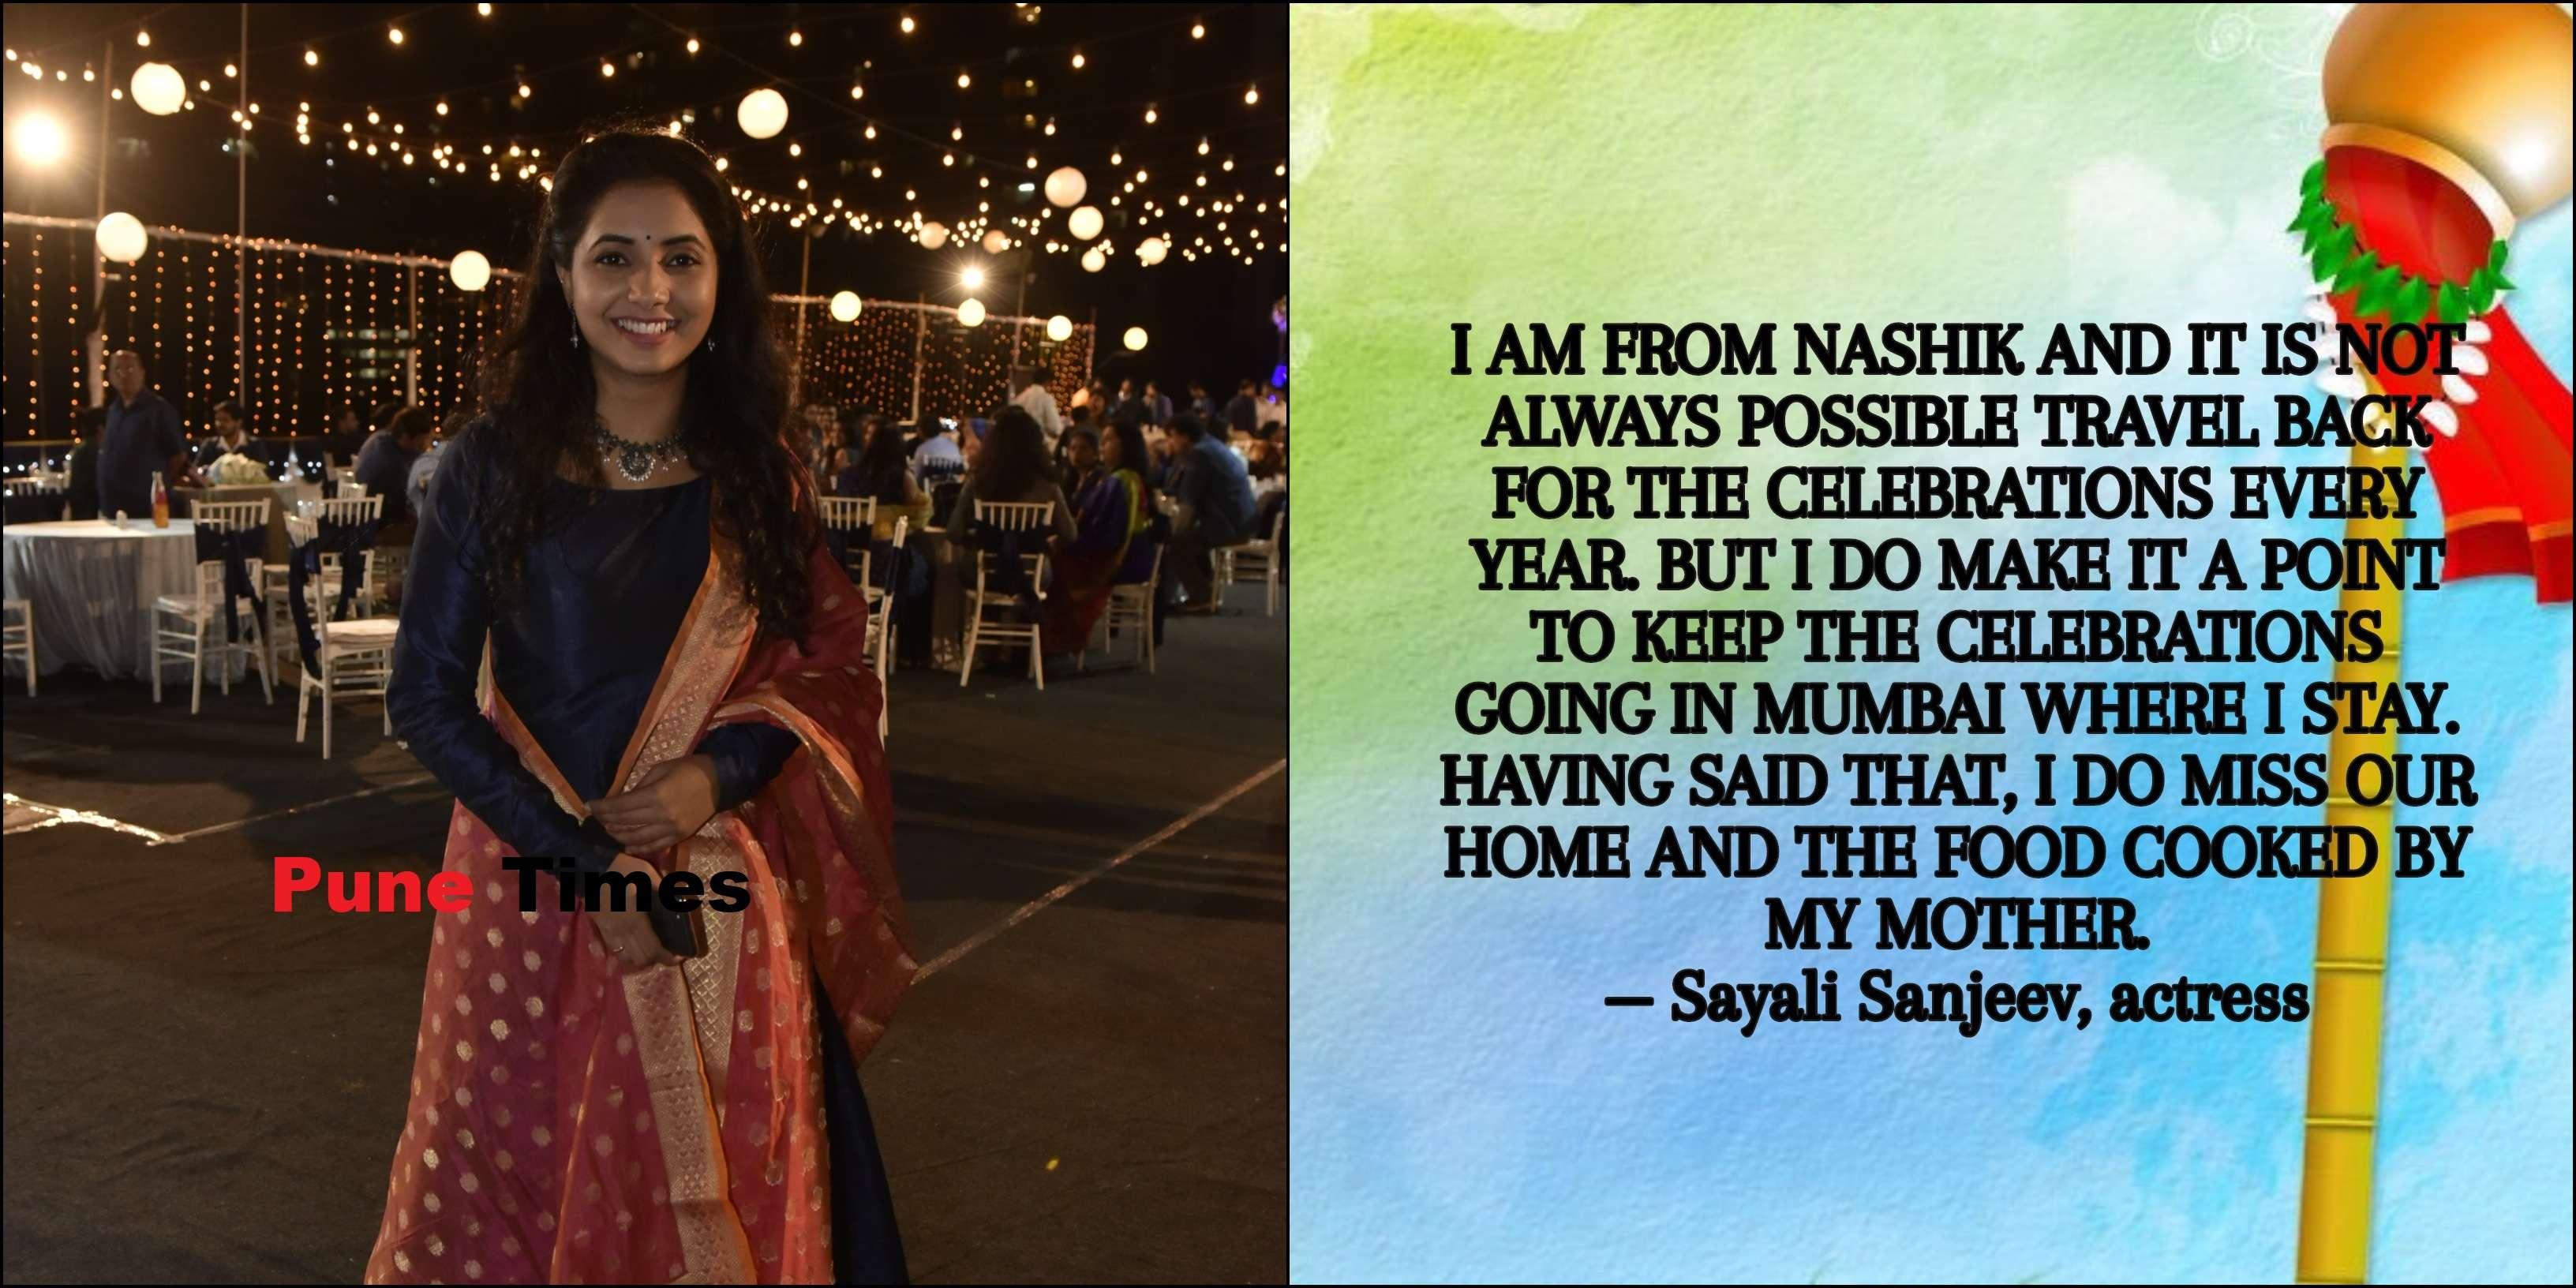 Sayali